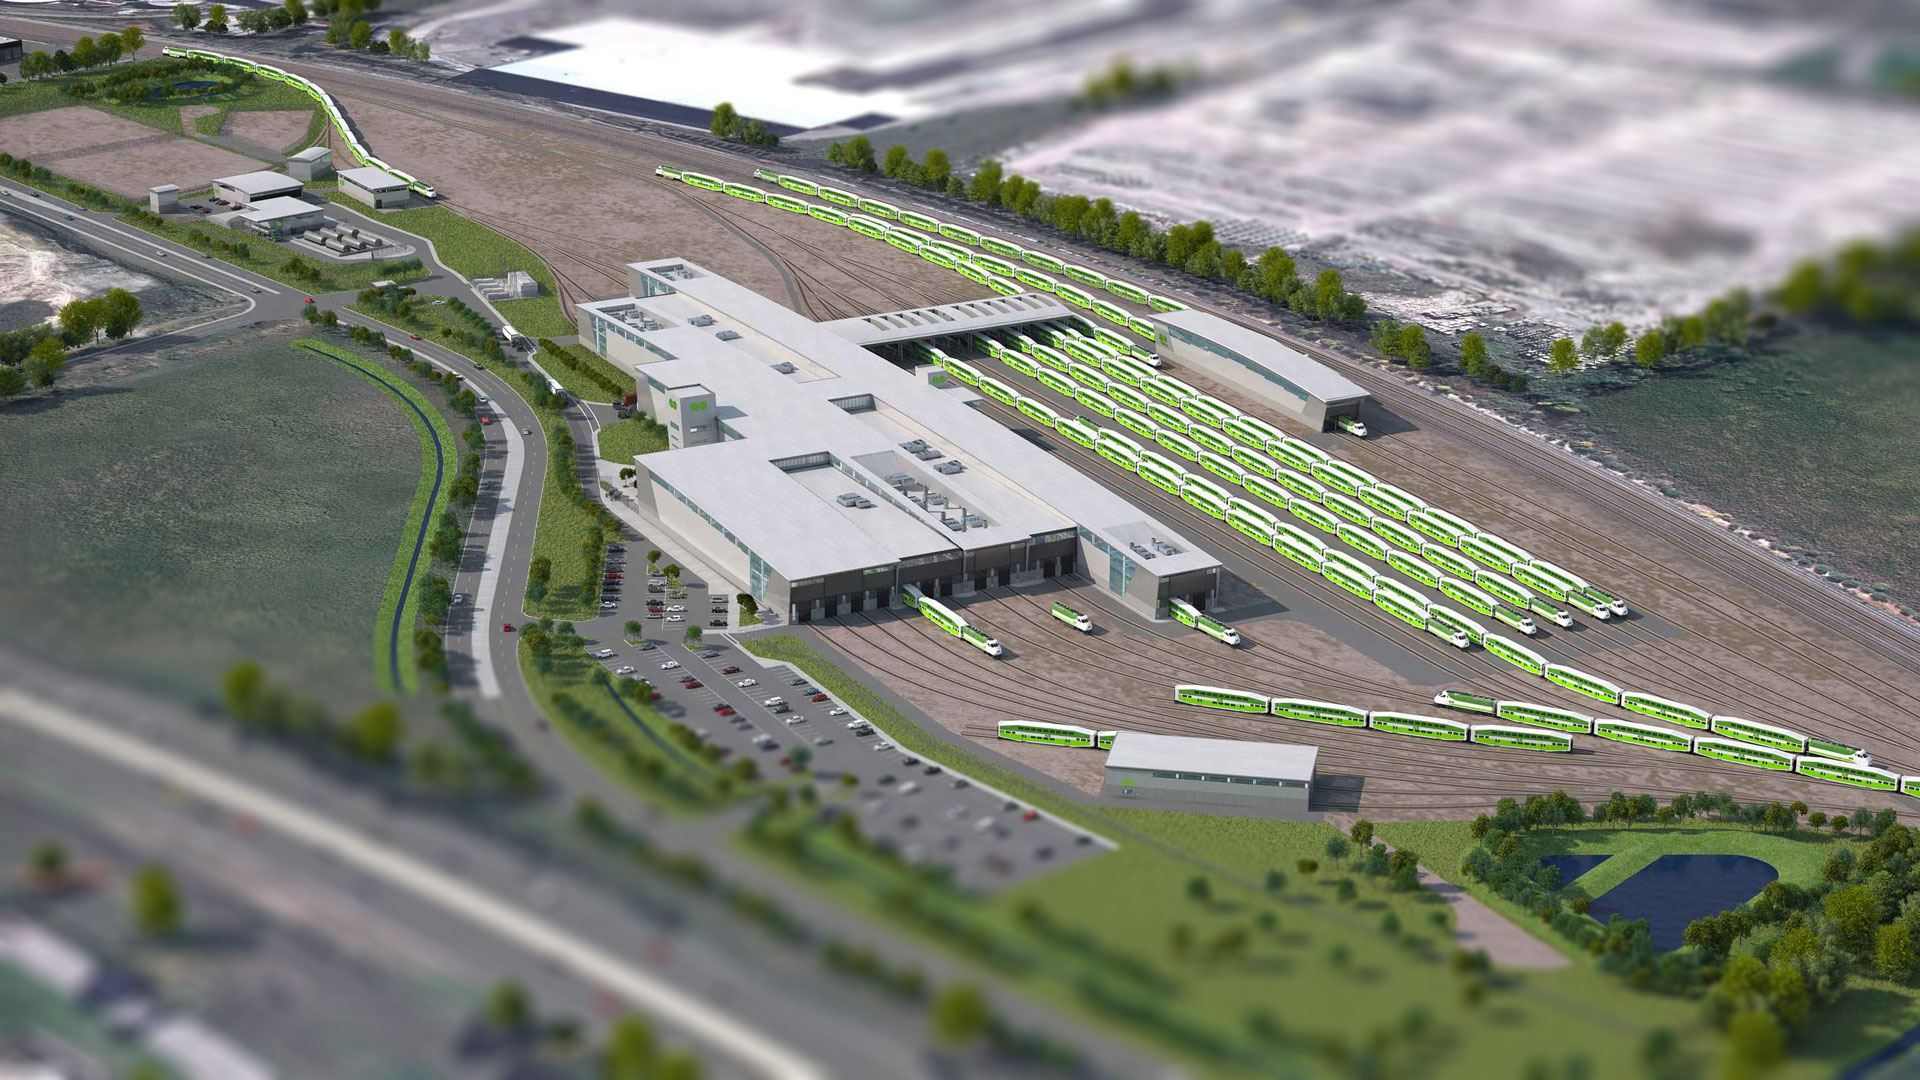 Aerial view of Metrolinx East Rail Maintenance Facilities